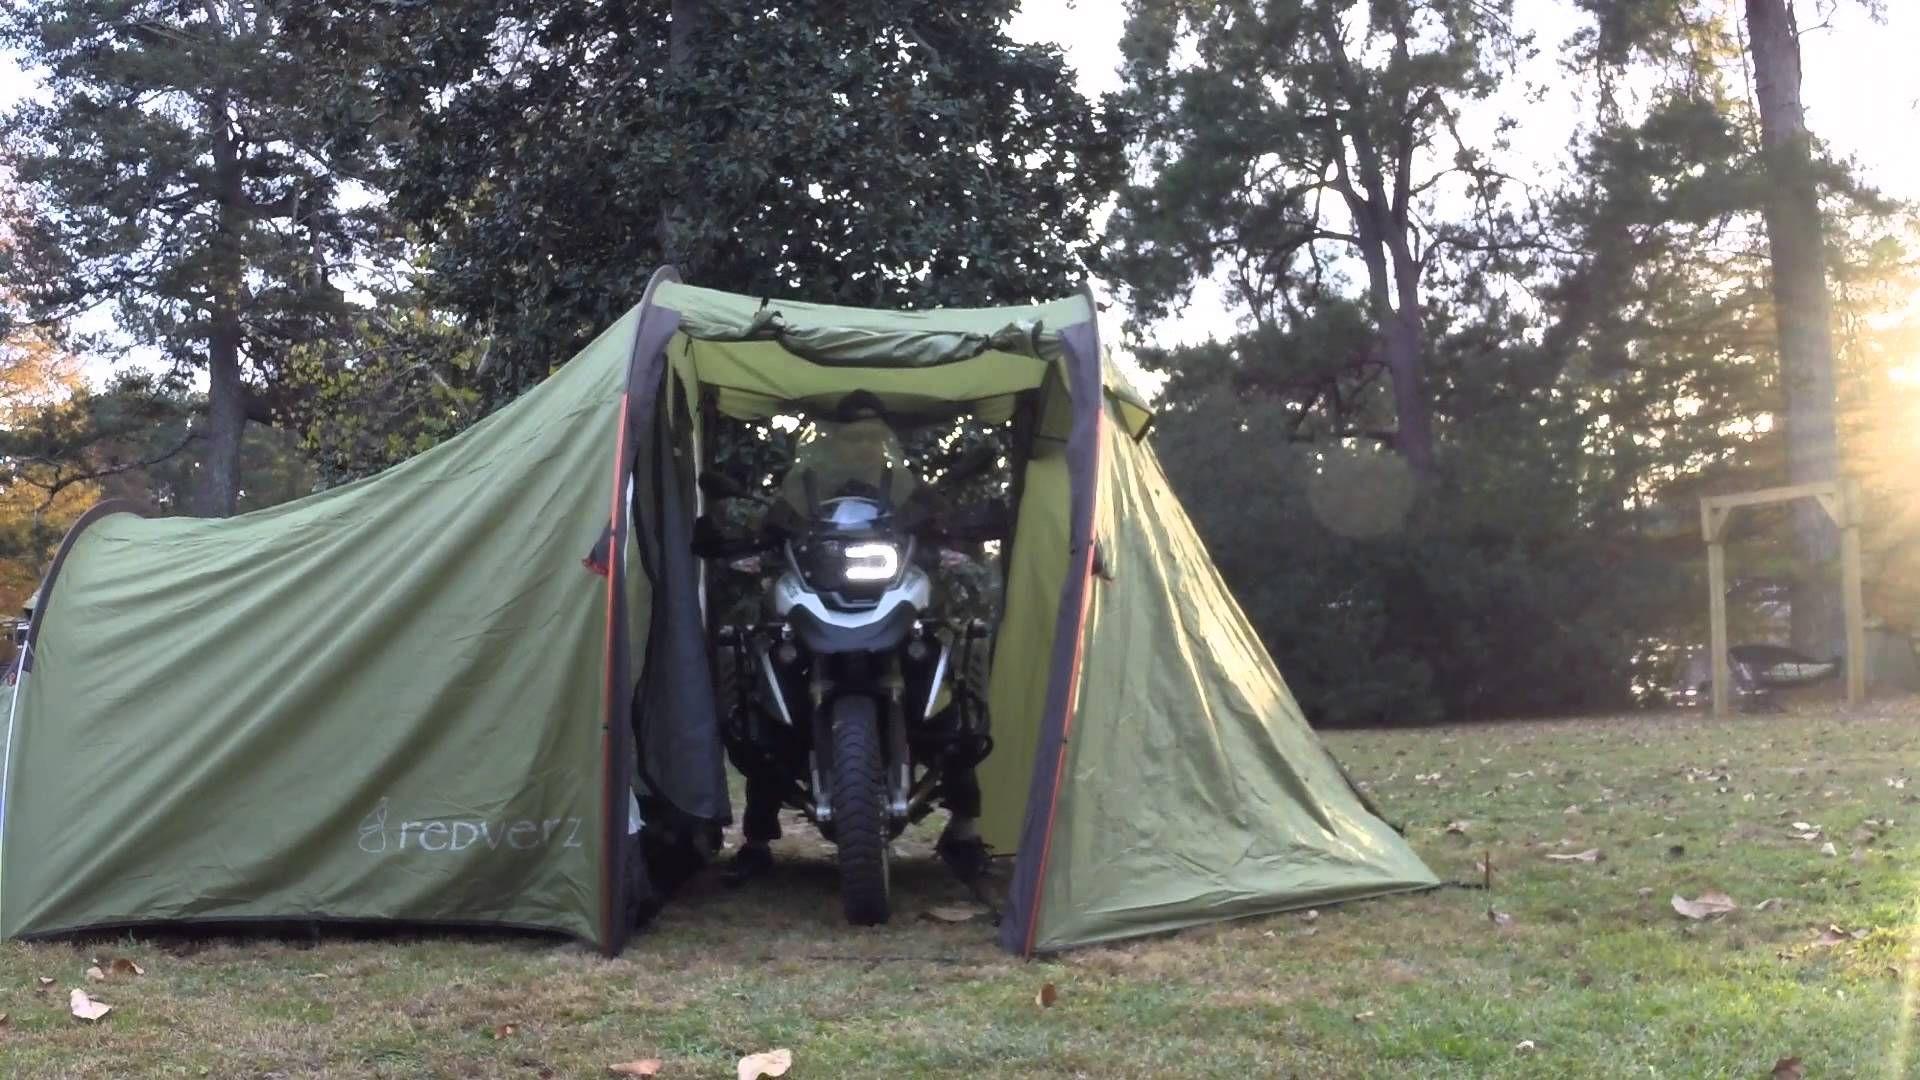 Redverz Tent Set Up 0f Atacama Motorcycle Expedition Tent & Redverz Tent Set Up 0f Atacama Motorcycle Expedition Tent ...